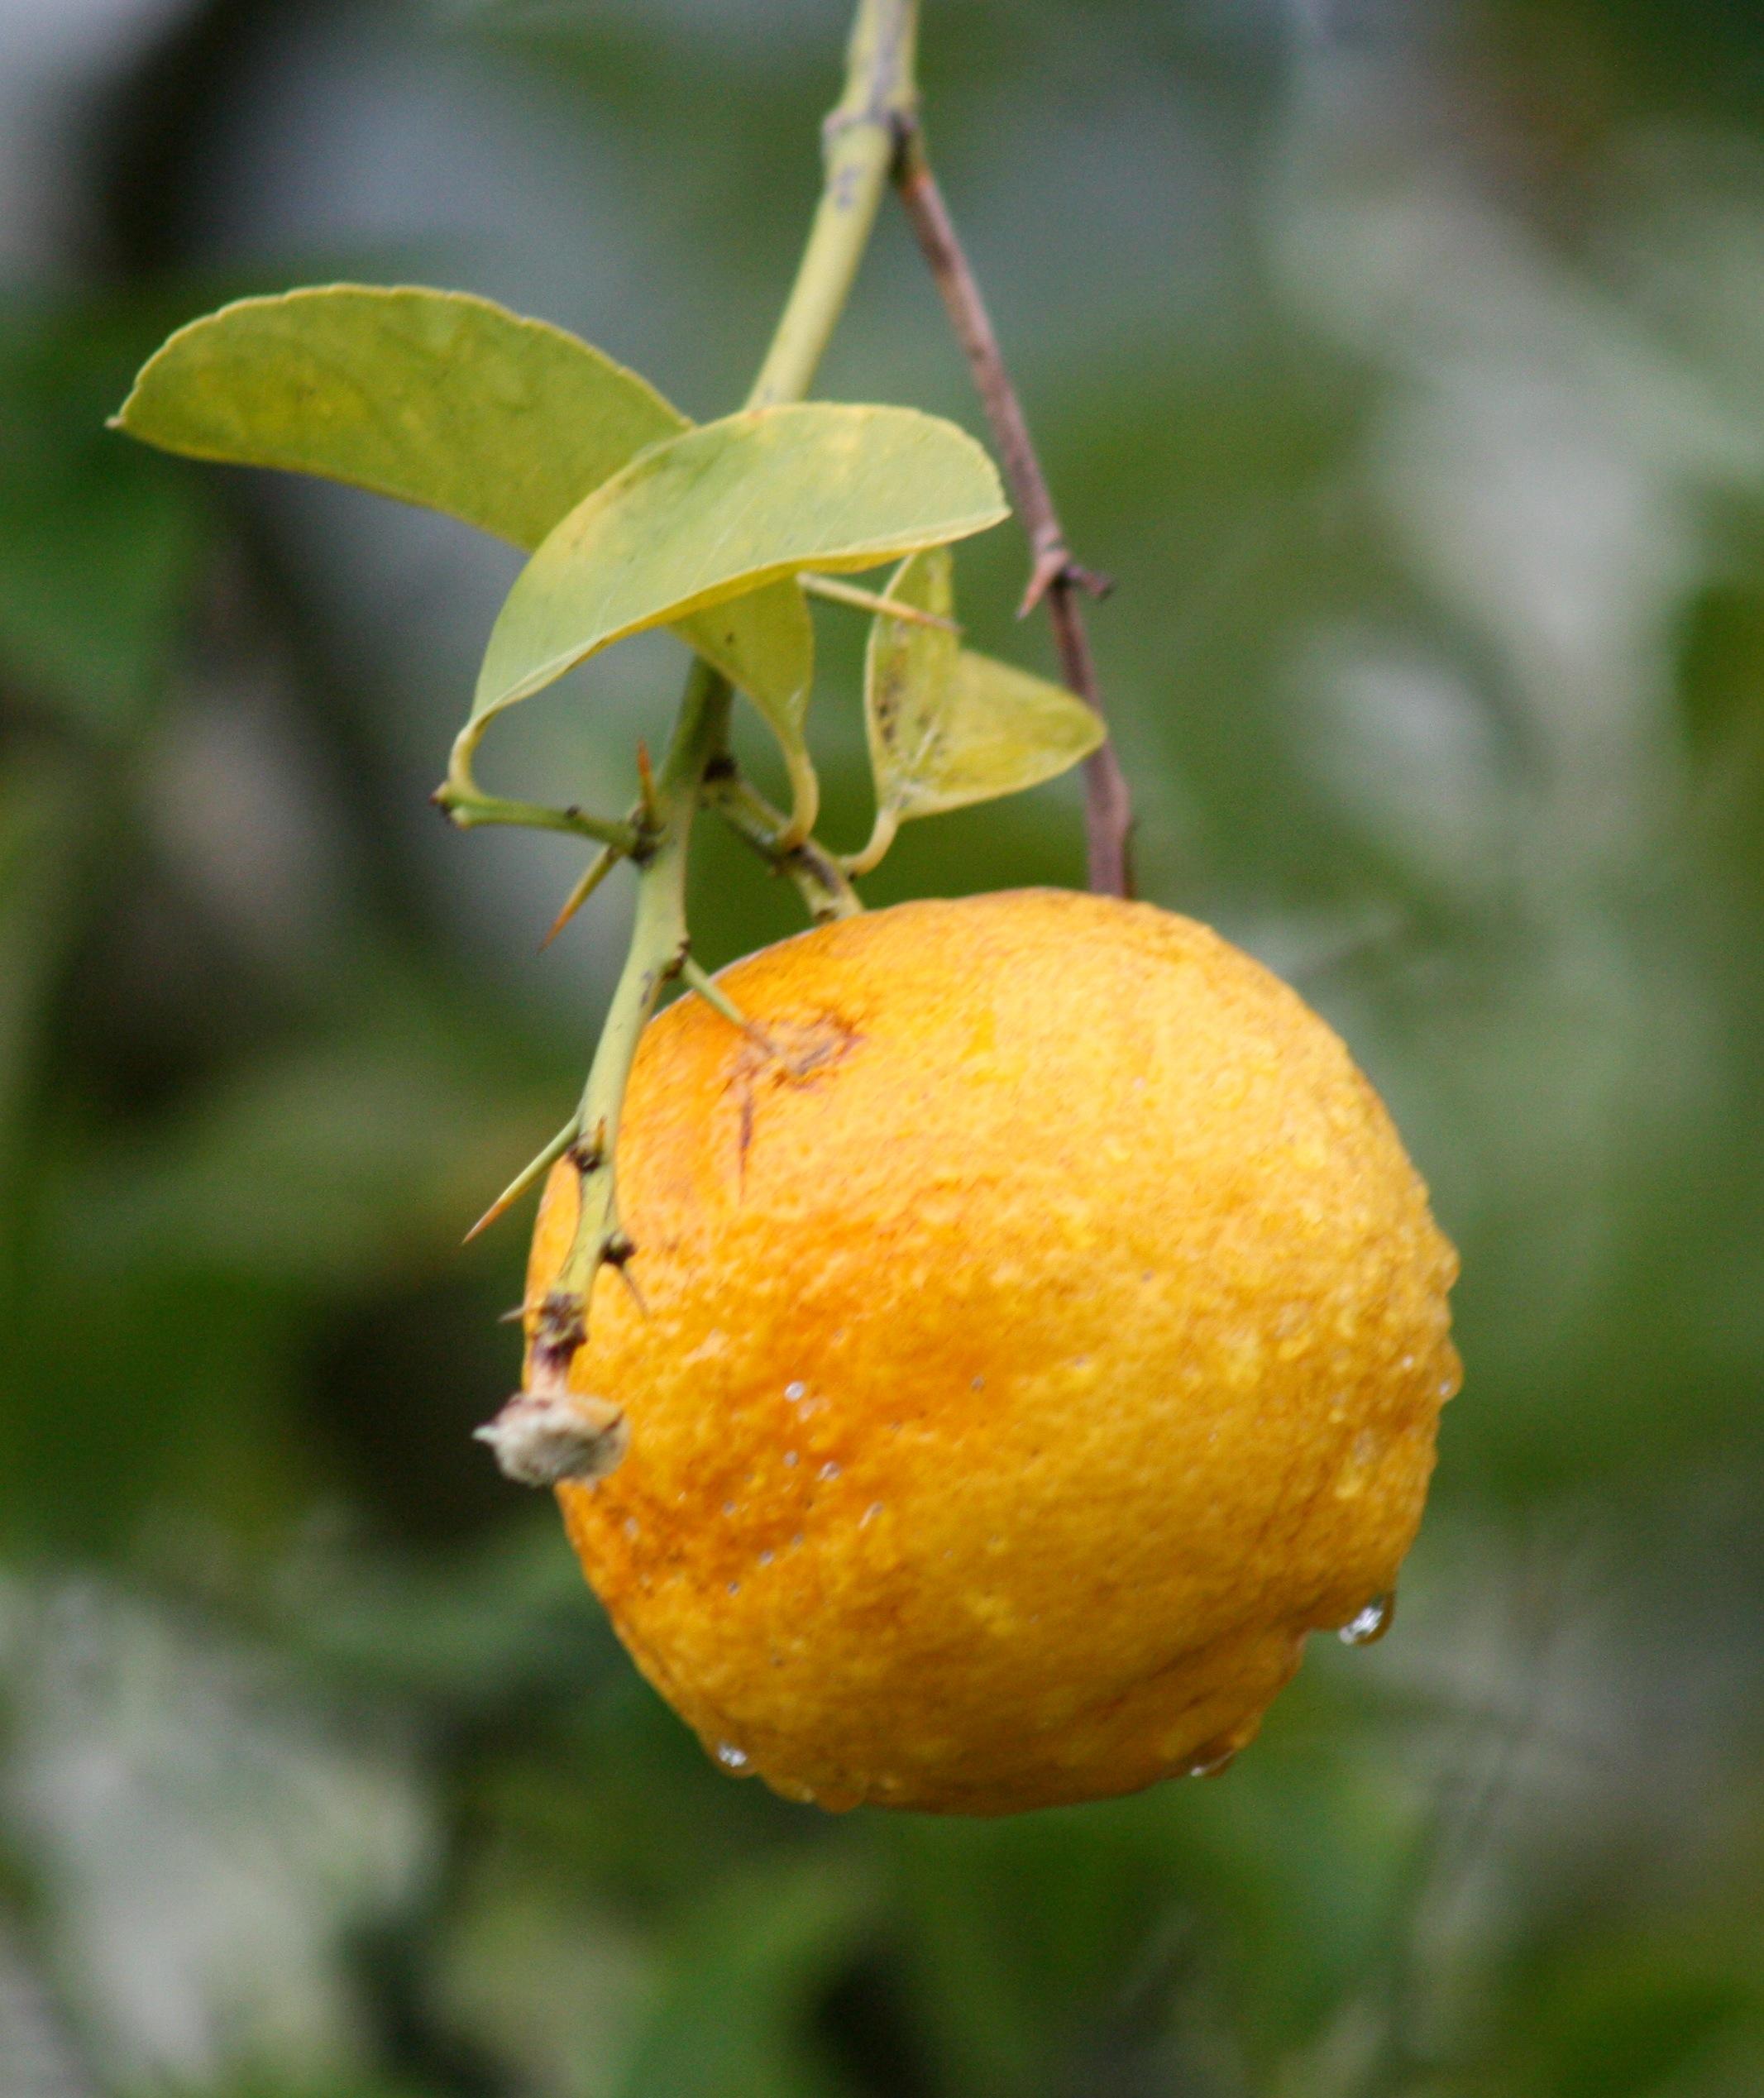 LemonOnTreeMG_2224_2